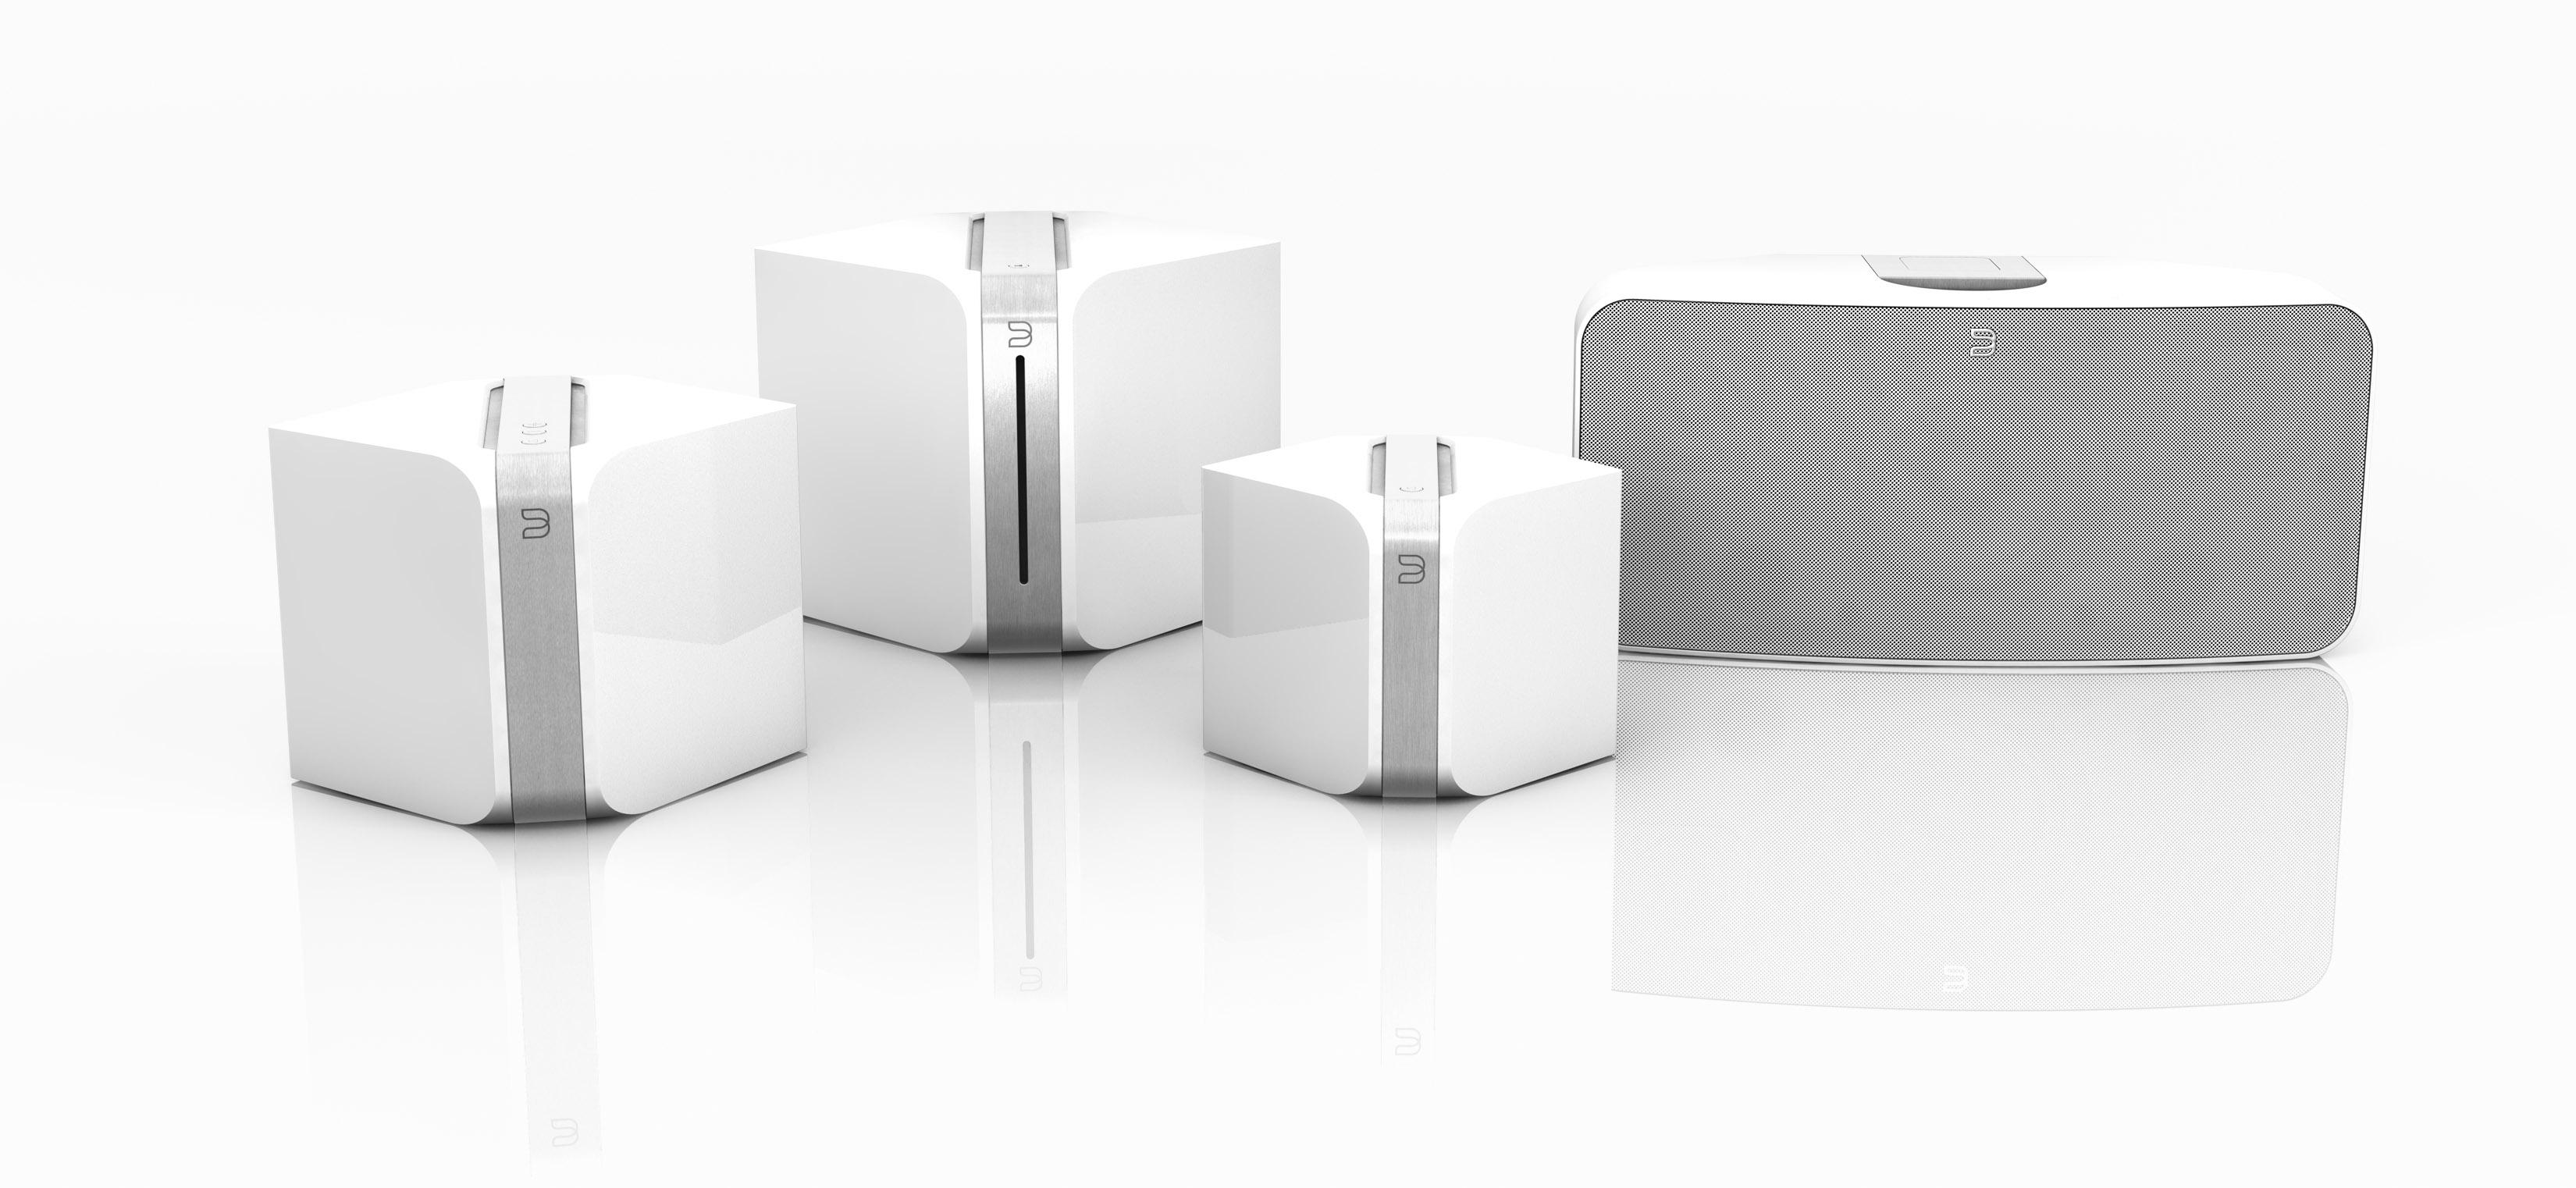 Bluesound wifi speakers in white.